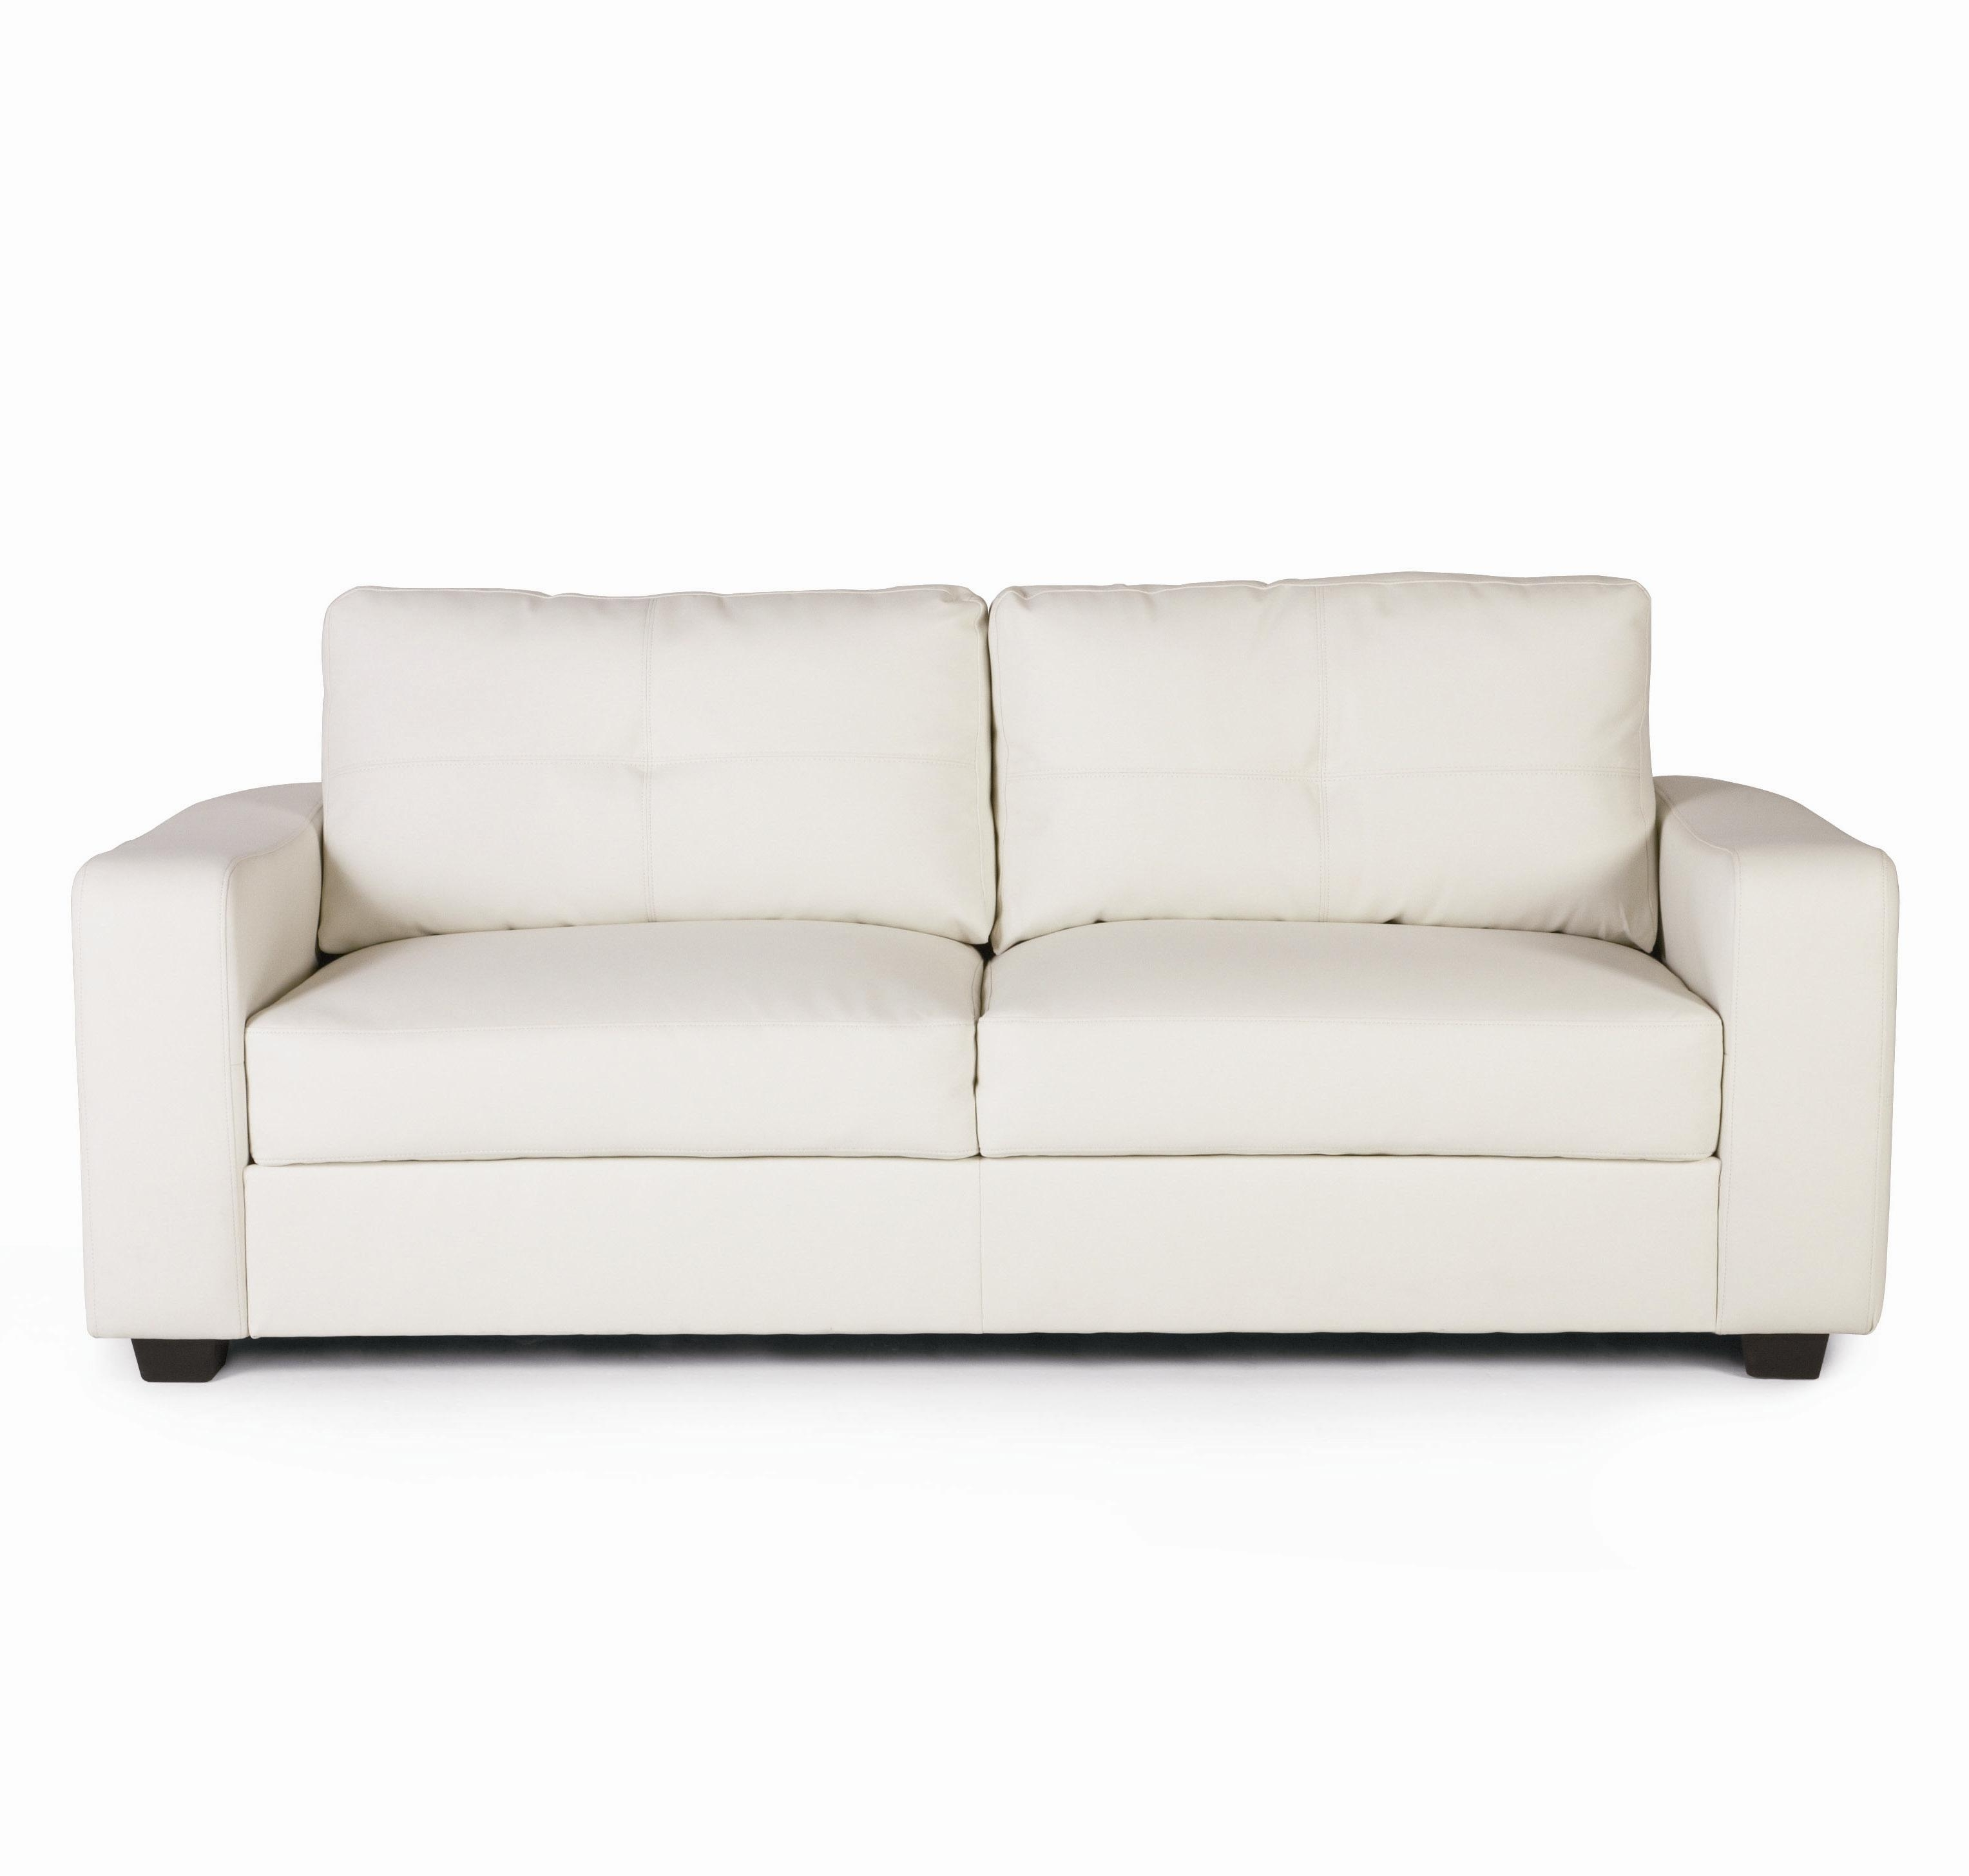 Lovely White Sofa Also Sofa Stunning Alan White Sofa 1 Alan White Pertaining To Most Recent White Modern Sofas (View 16 of 20)